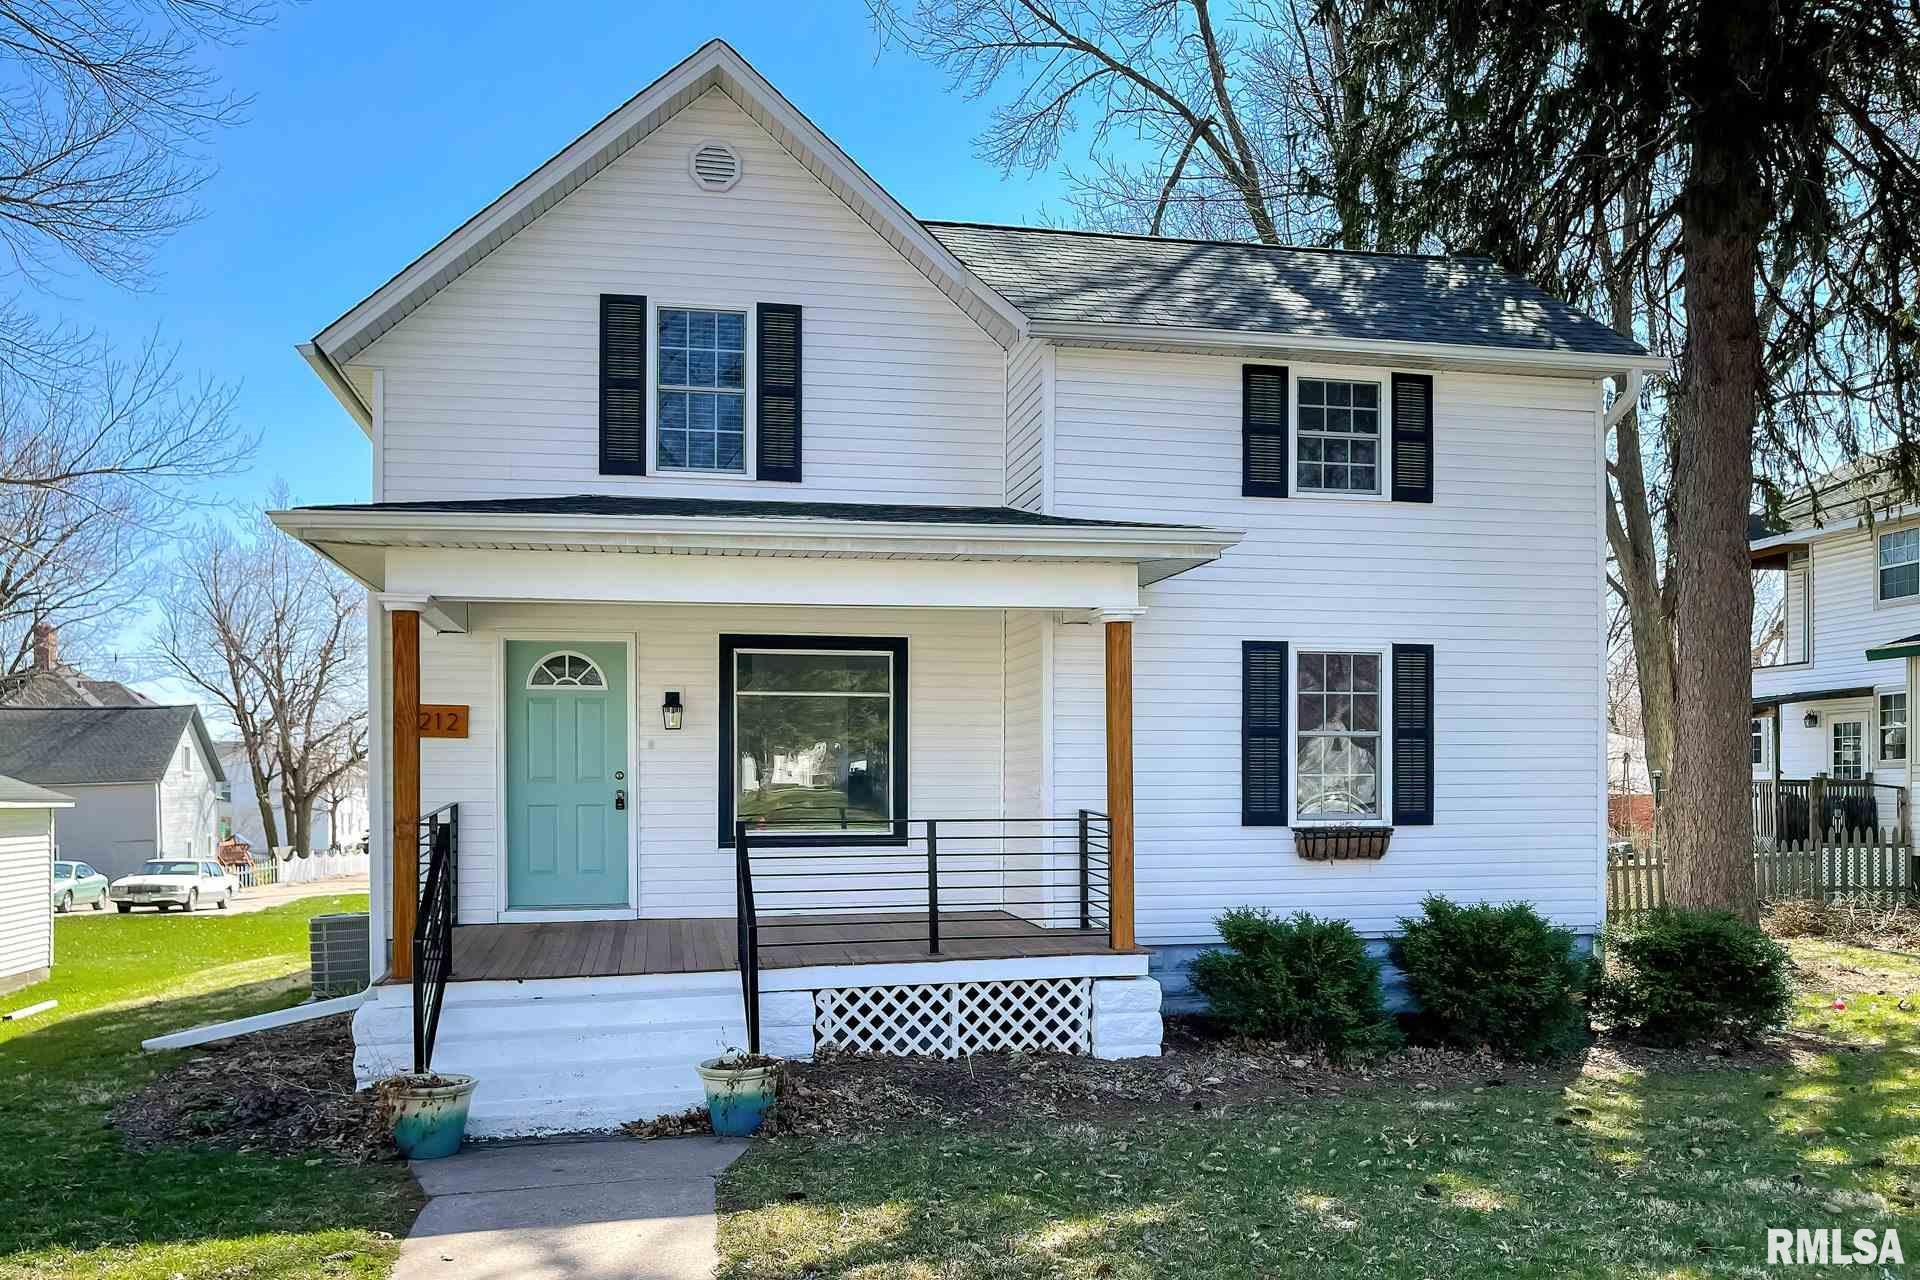 212 W 6TH Property Photo - Wilton, IA real estate listing